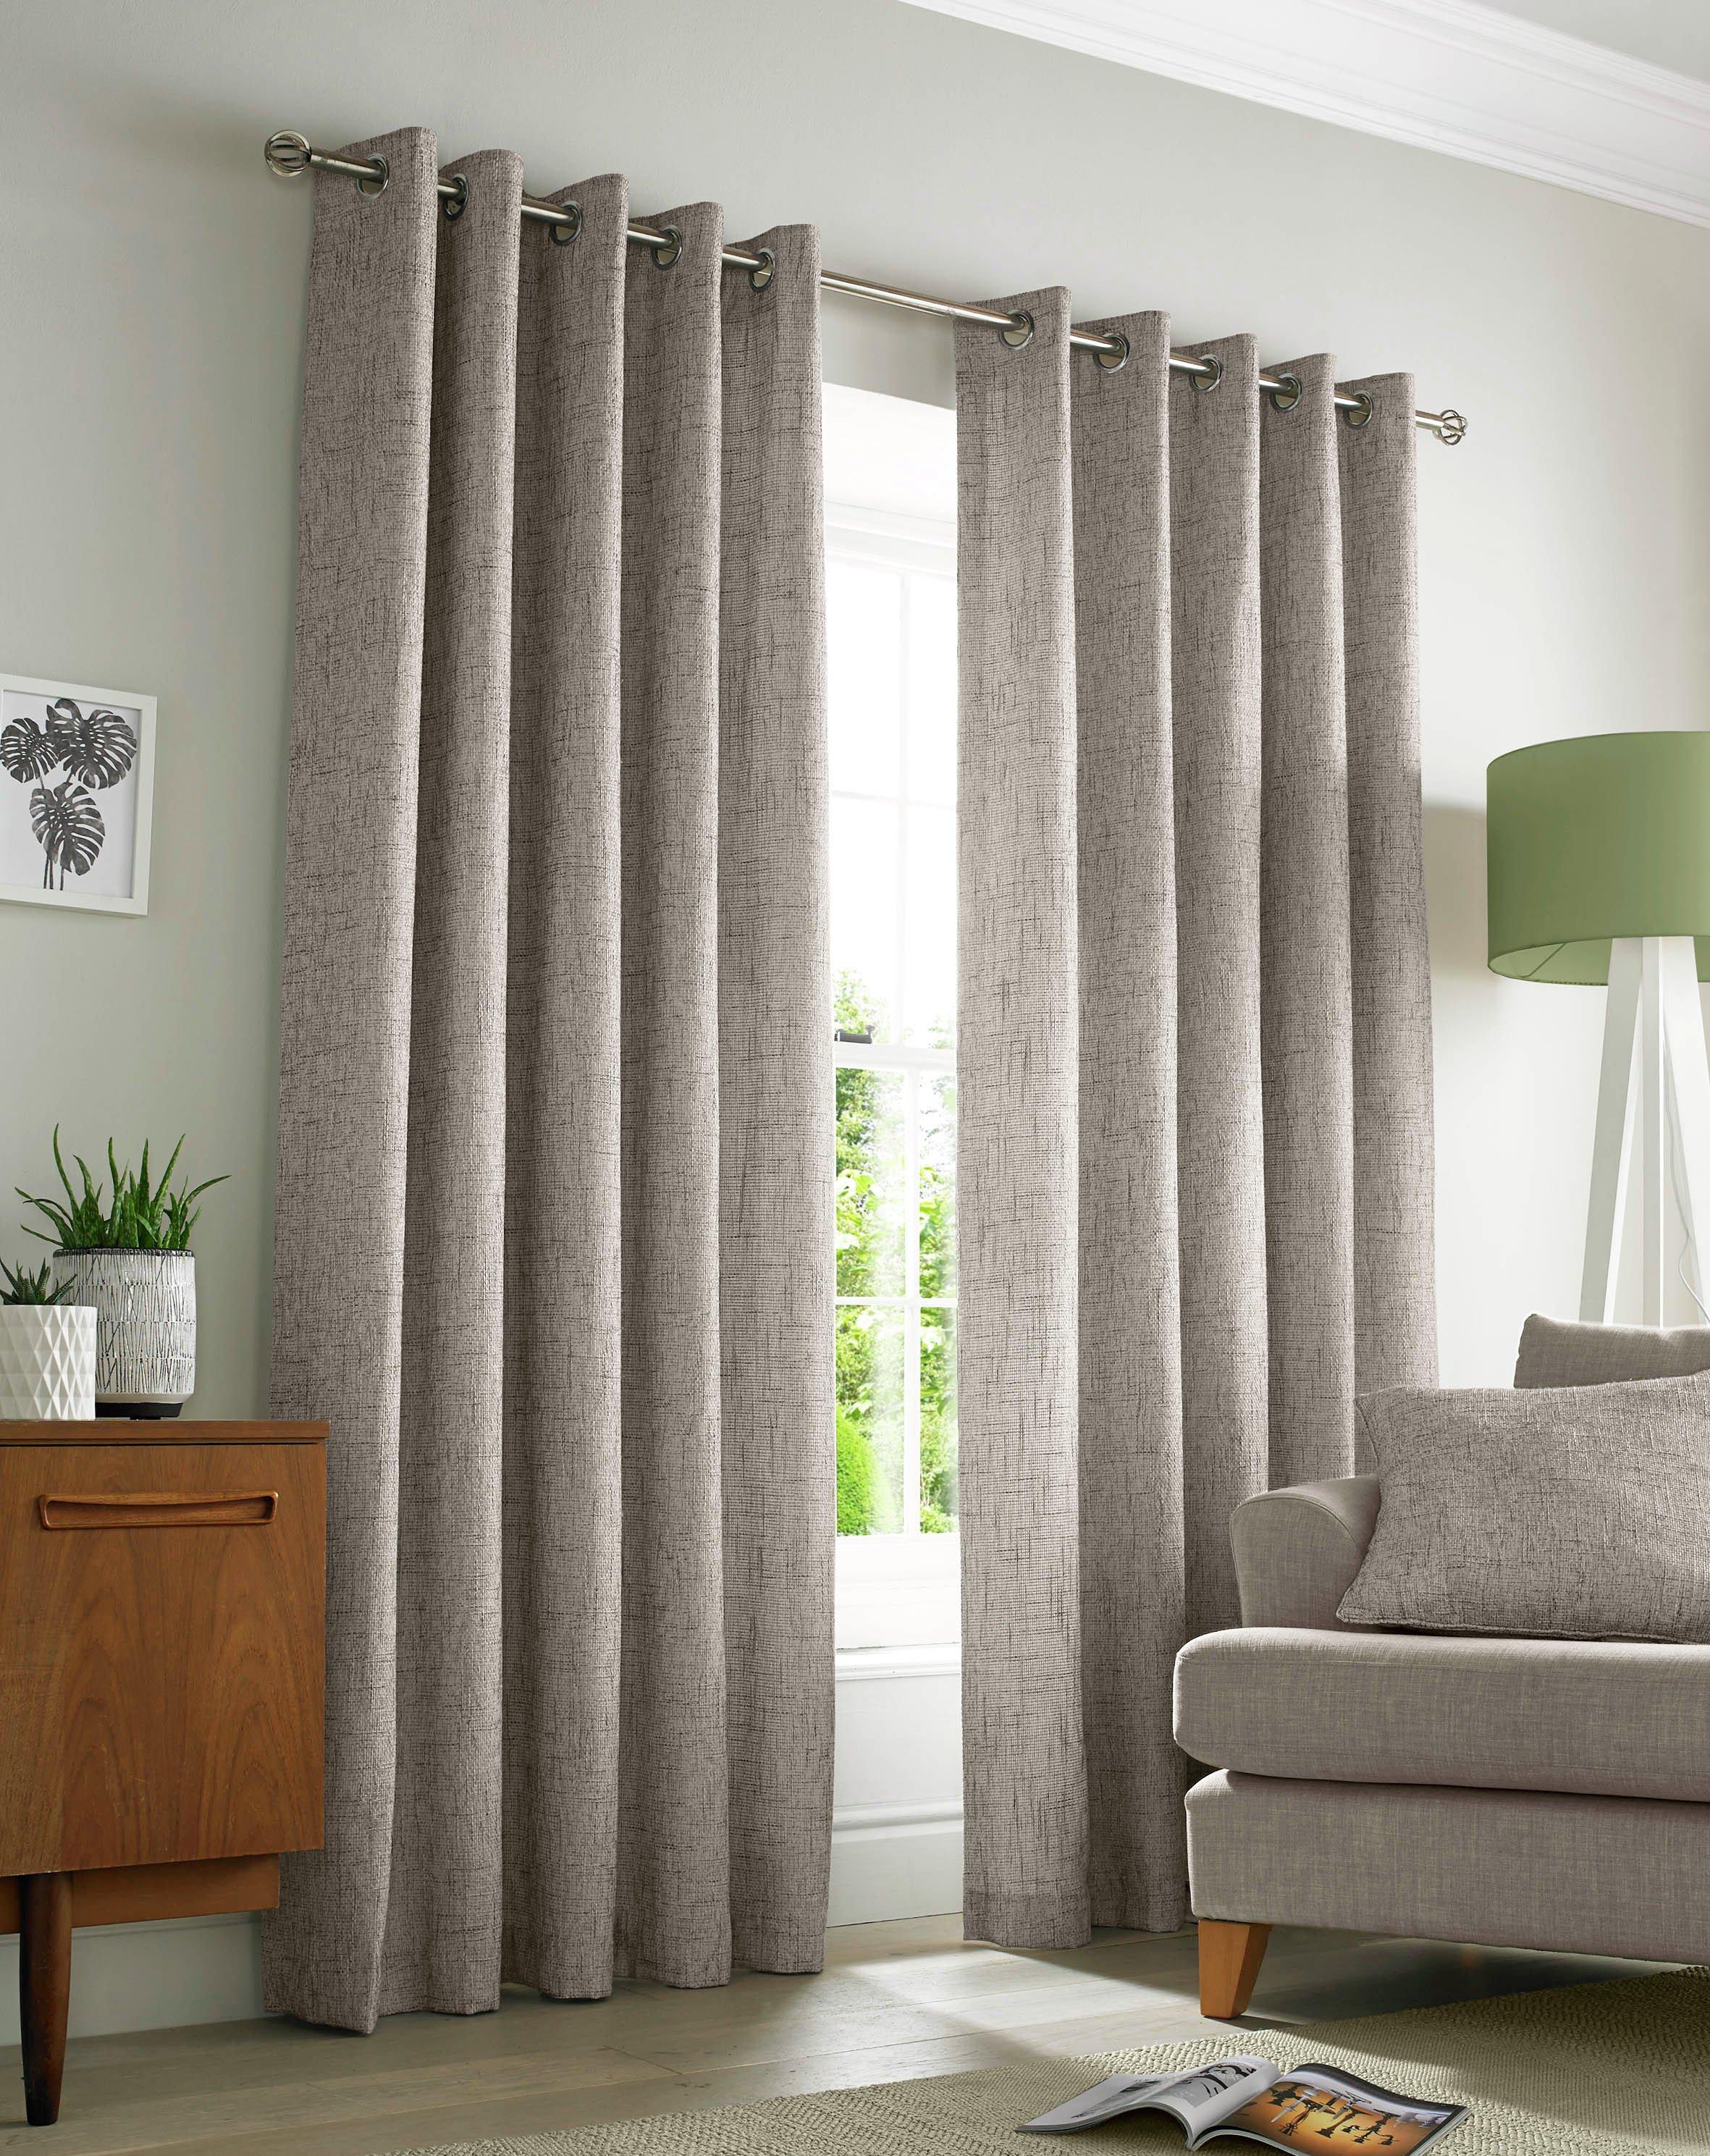 Academy Eyelet Curtains - 165x137cm - Natural.